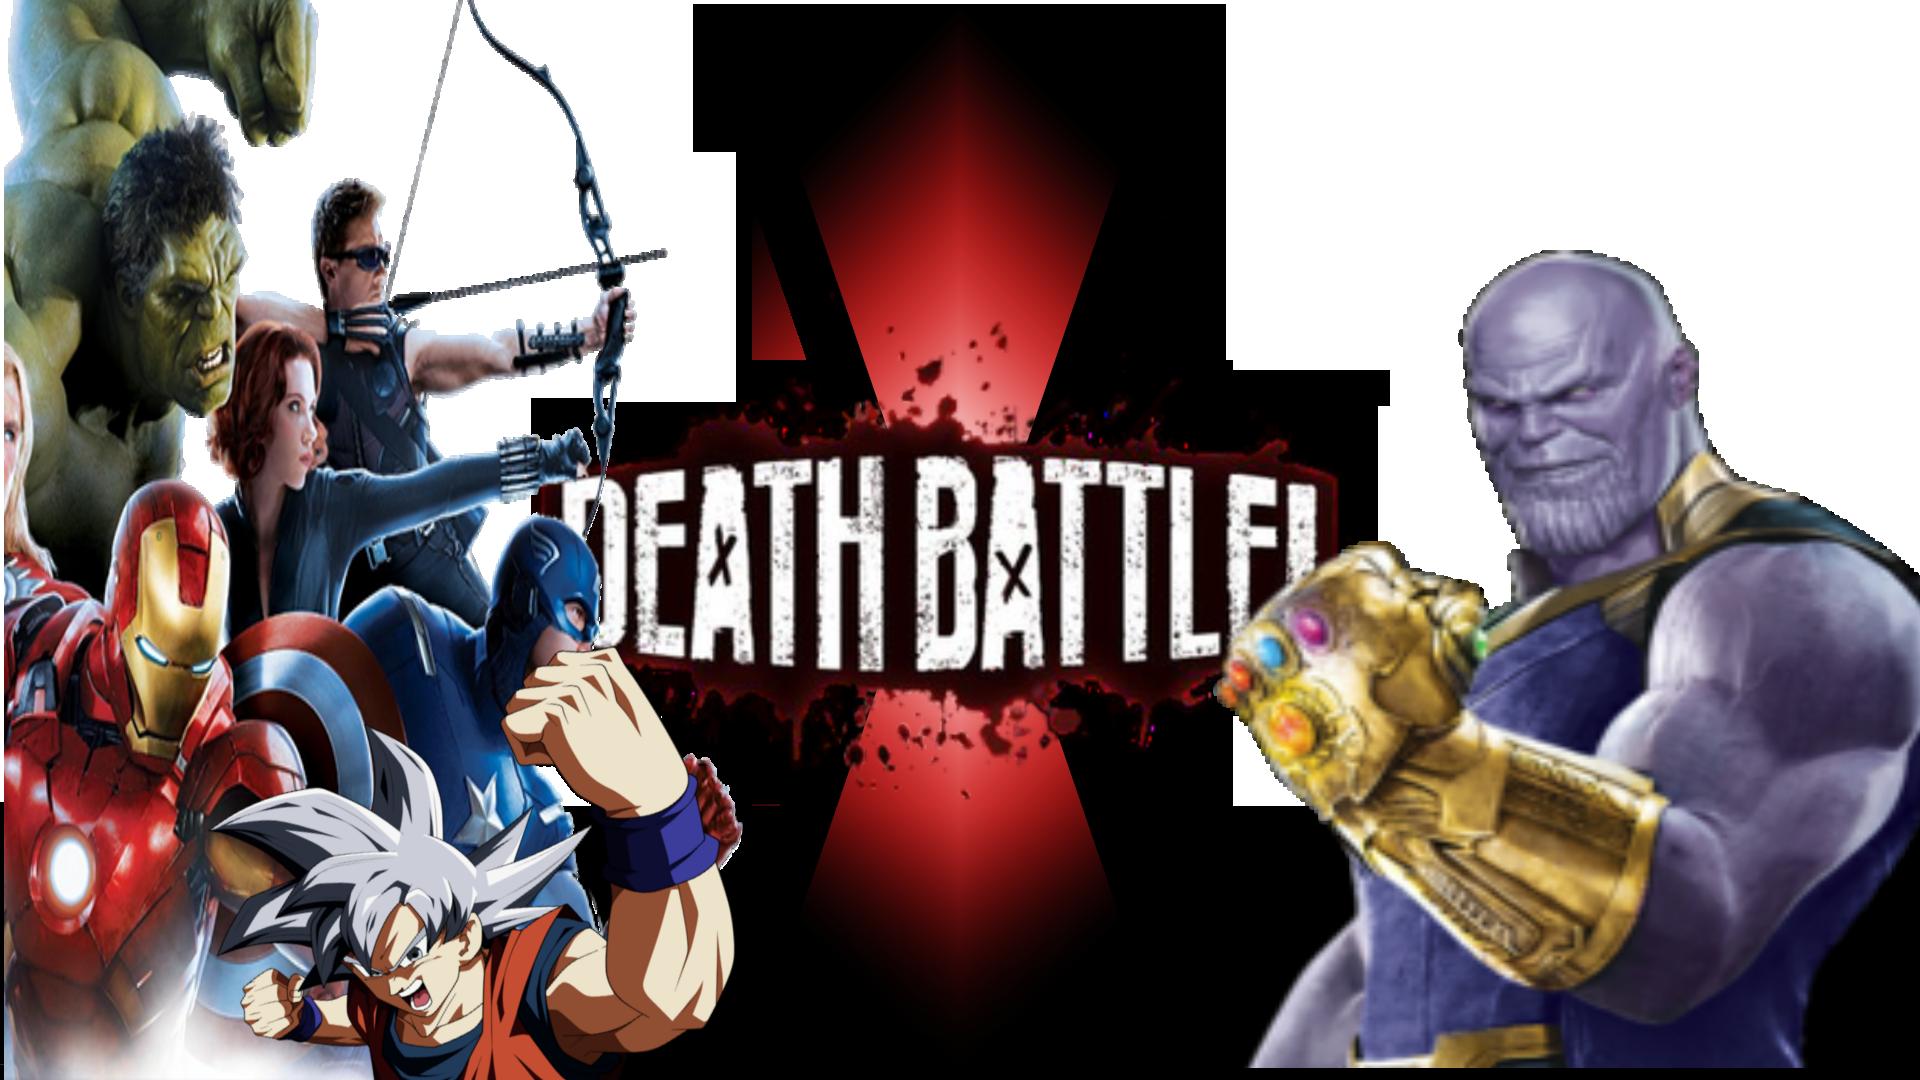 Goku Vs Thanos: Avengers (Movie) And Goku Vs Thanos (Movie)